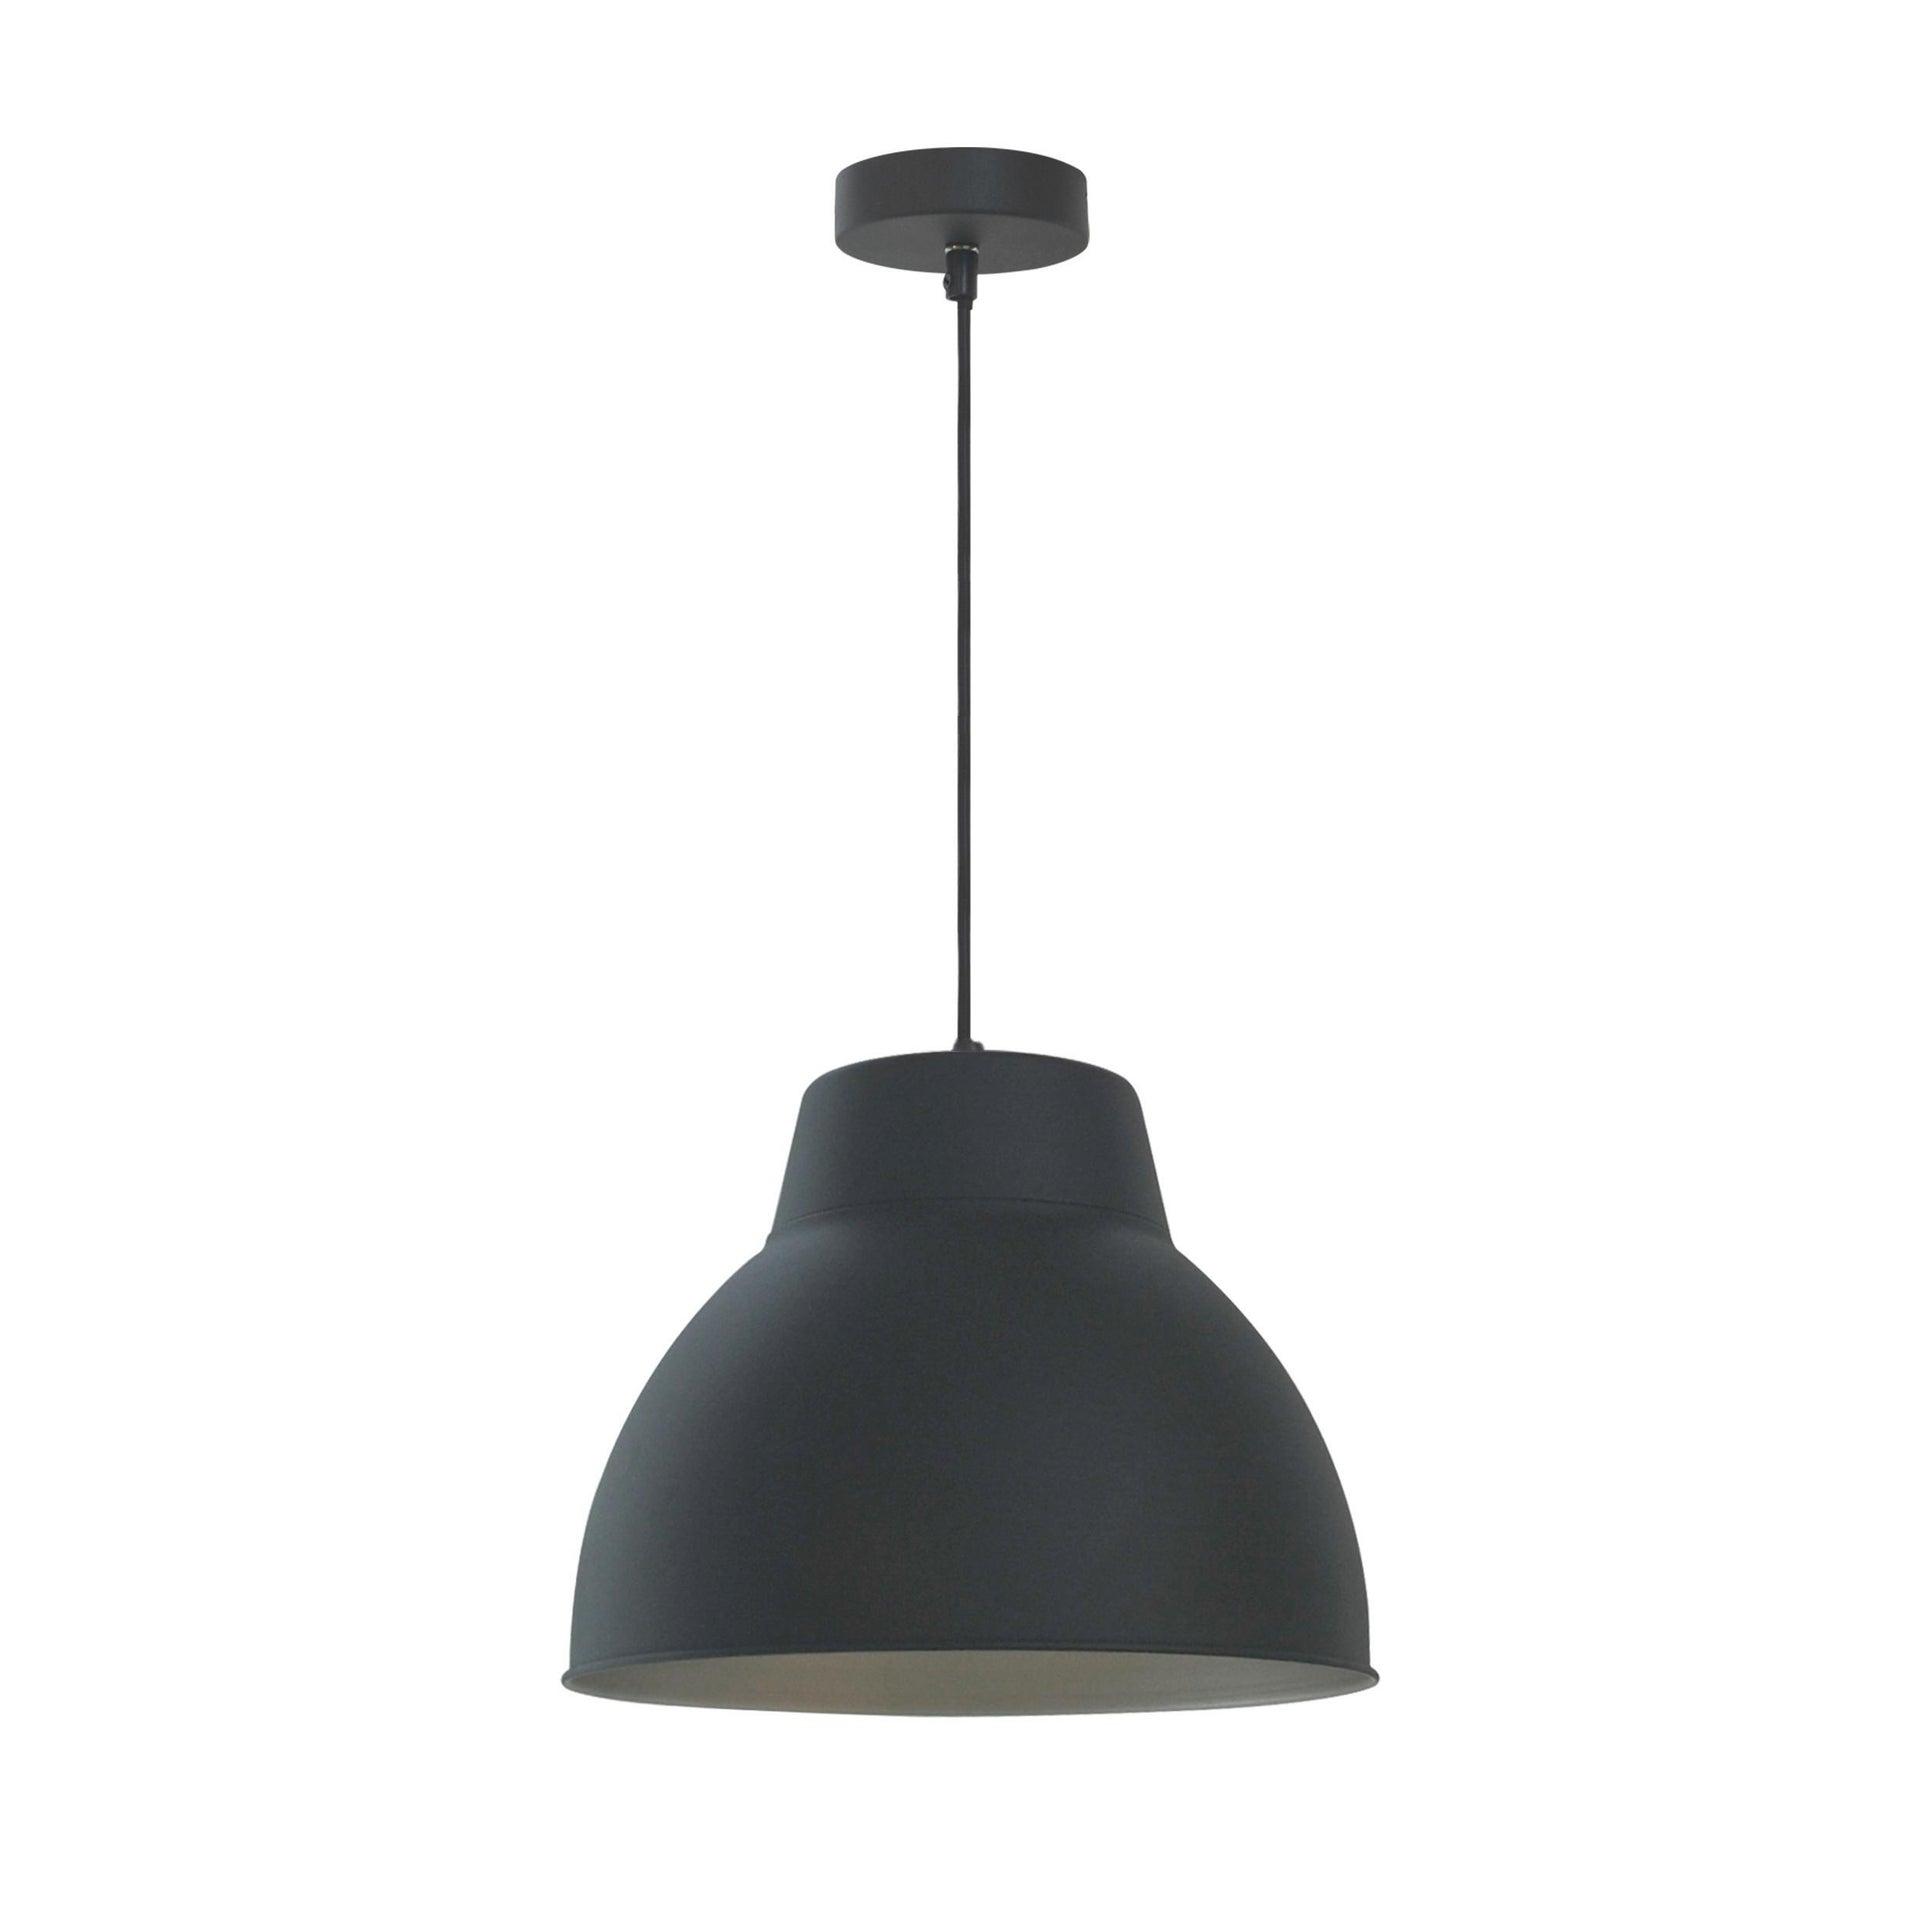 Lampadario Industriale Mezzo nero in metallo, D. 45 cm, INSPIRE - 3